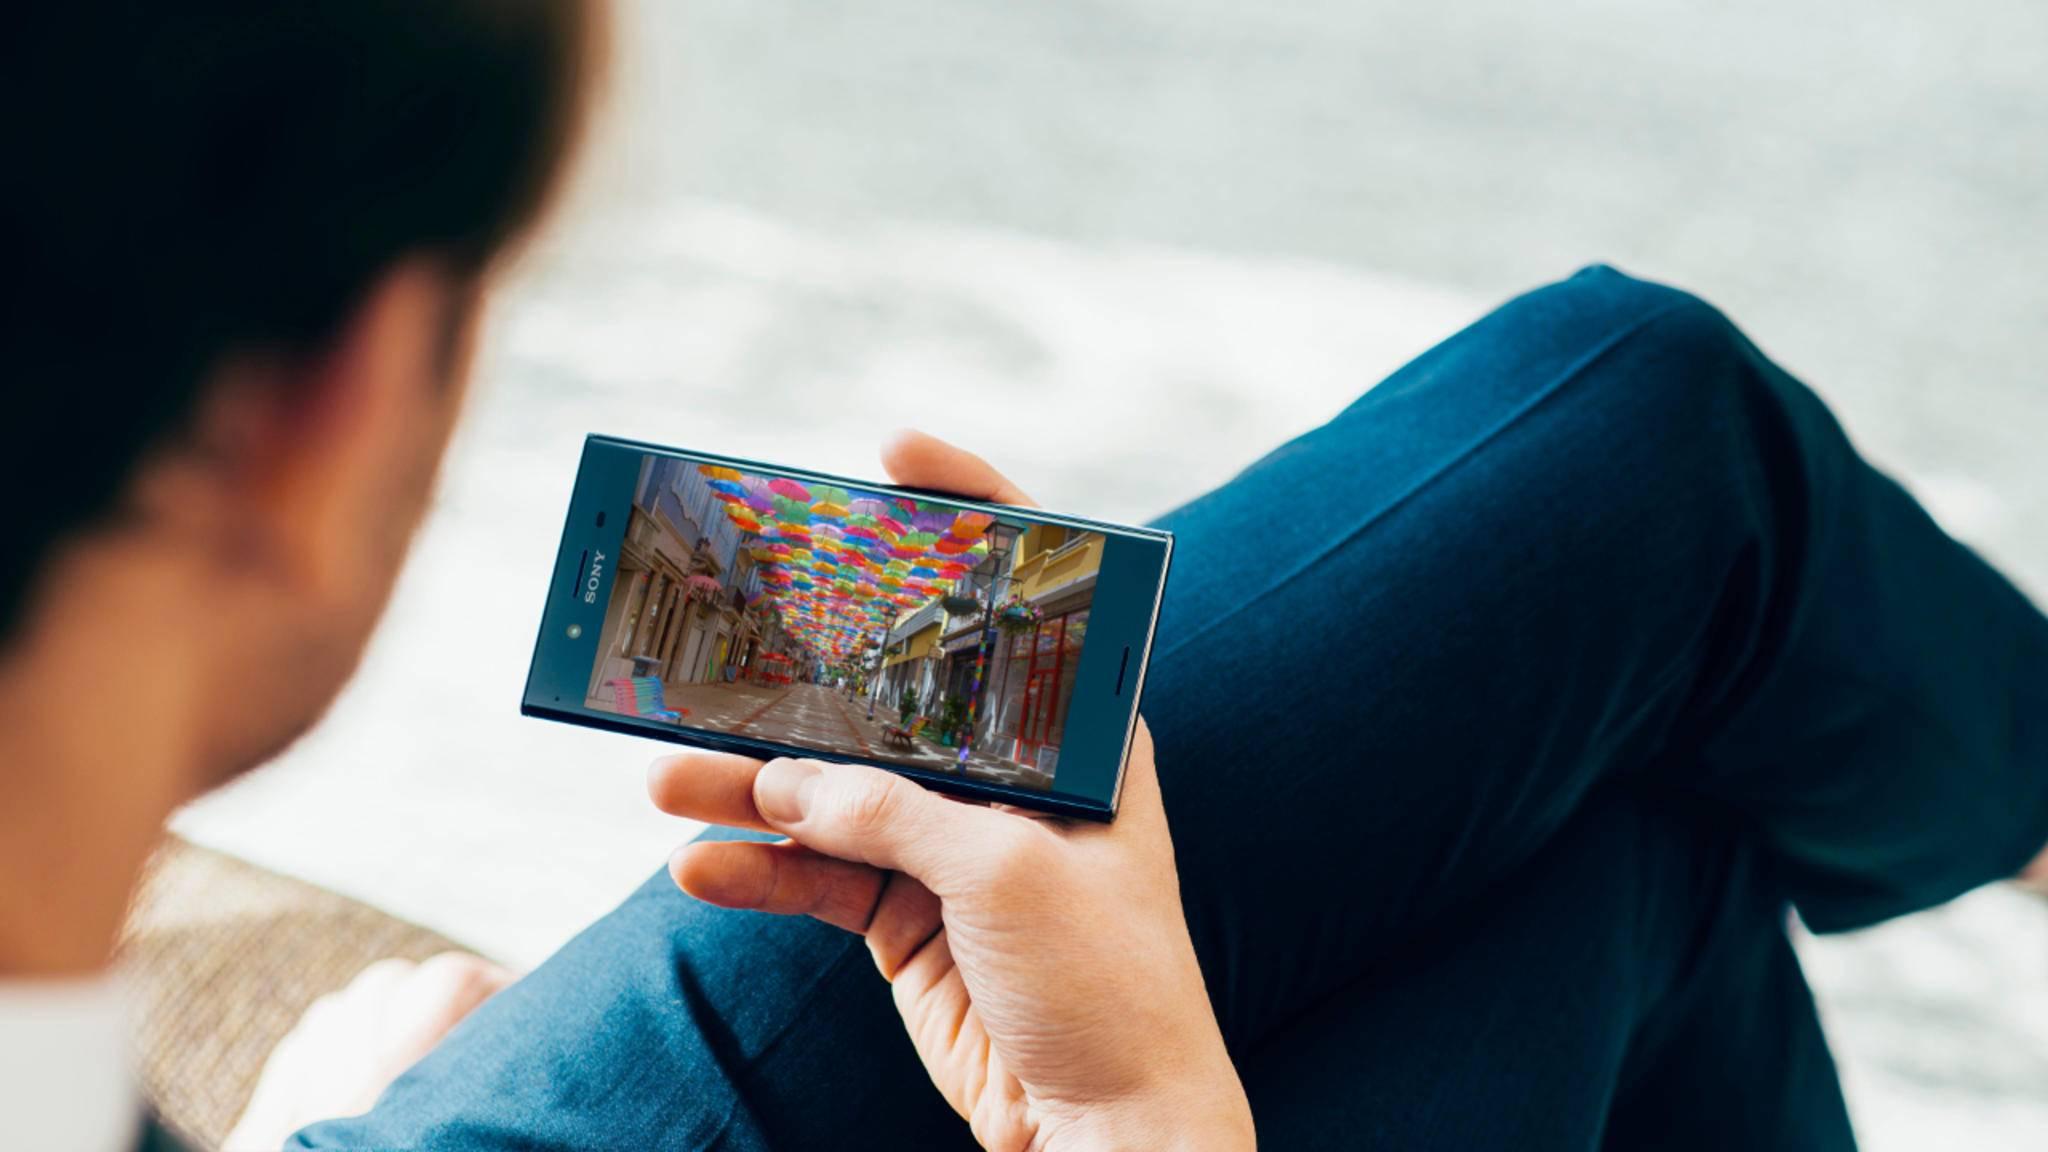 Das Xperia XZ Premium hat ein 4K-HDR-Display.